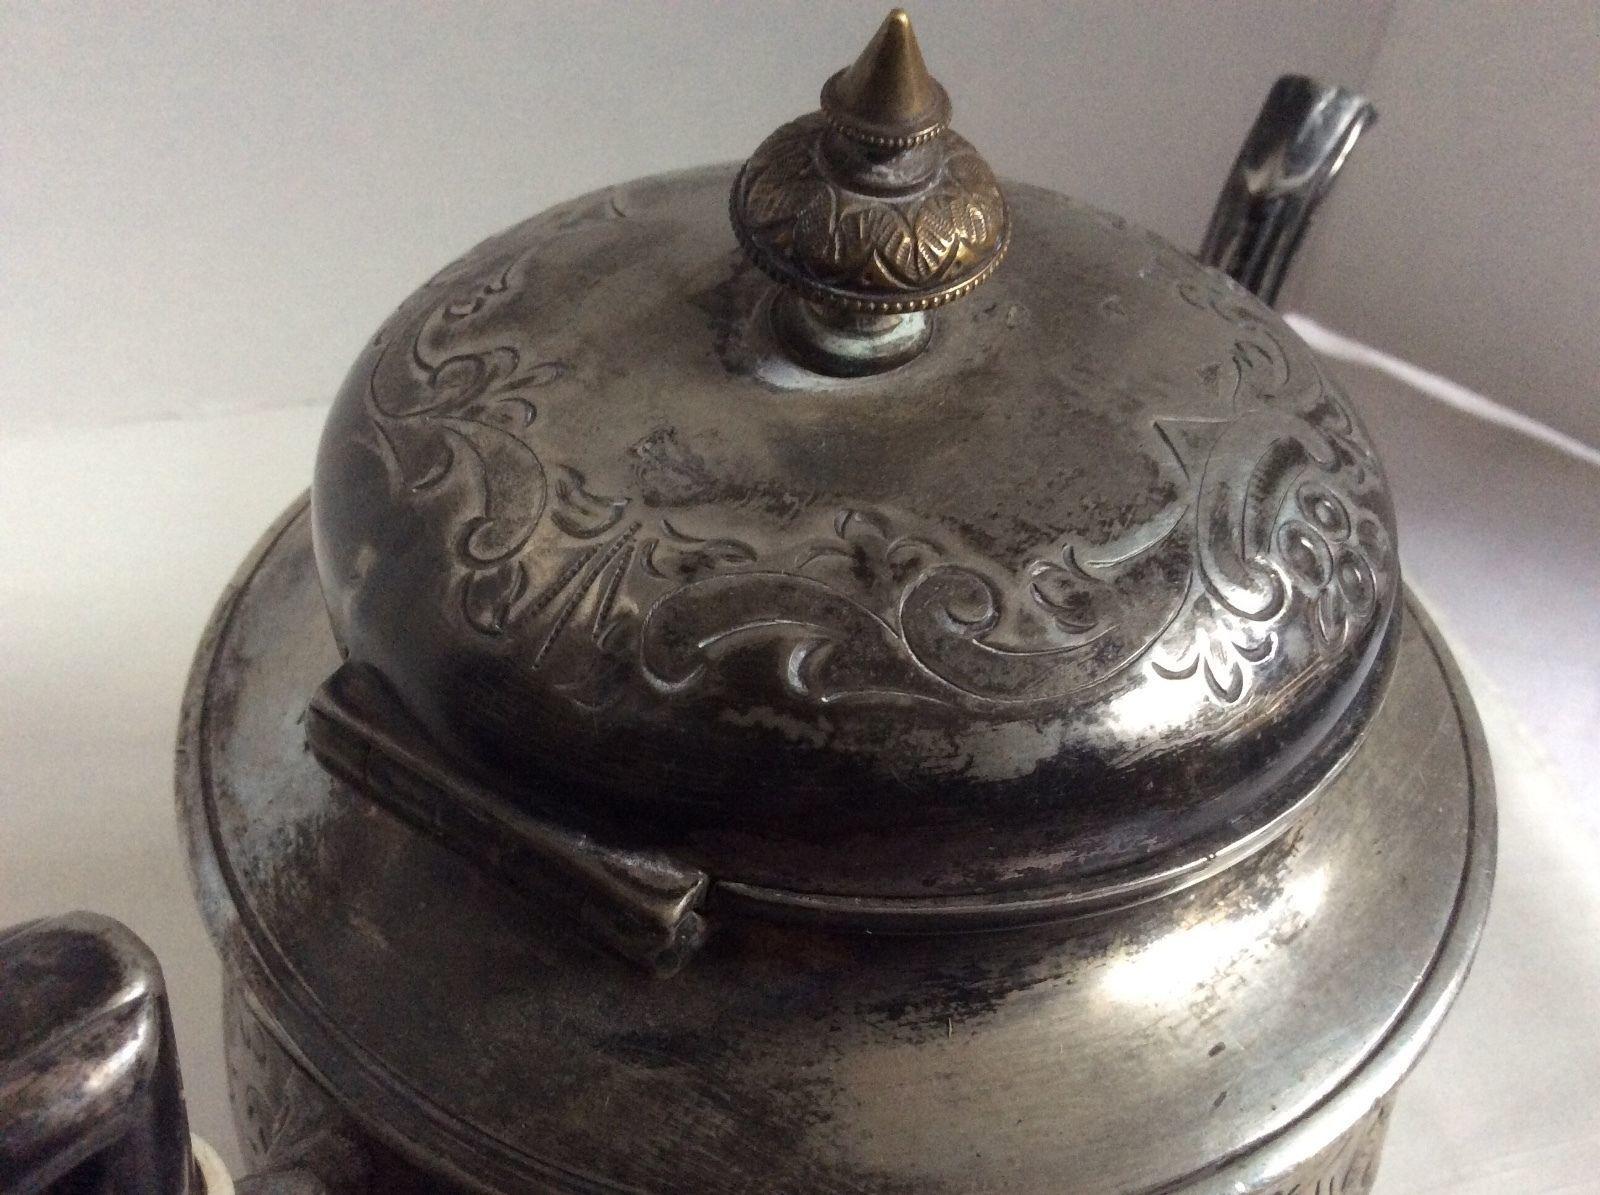 Antique AB&Co Albert J. Beardshaw Sheffield England 1860's silverplate teapot